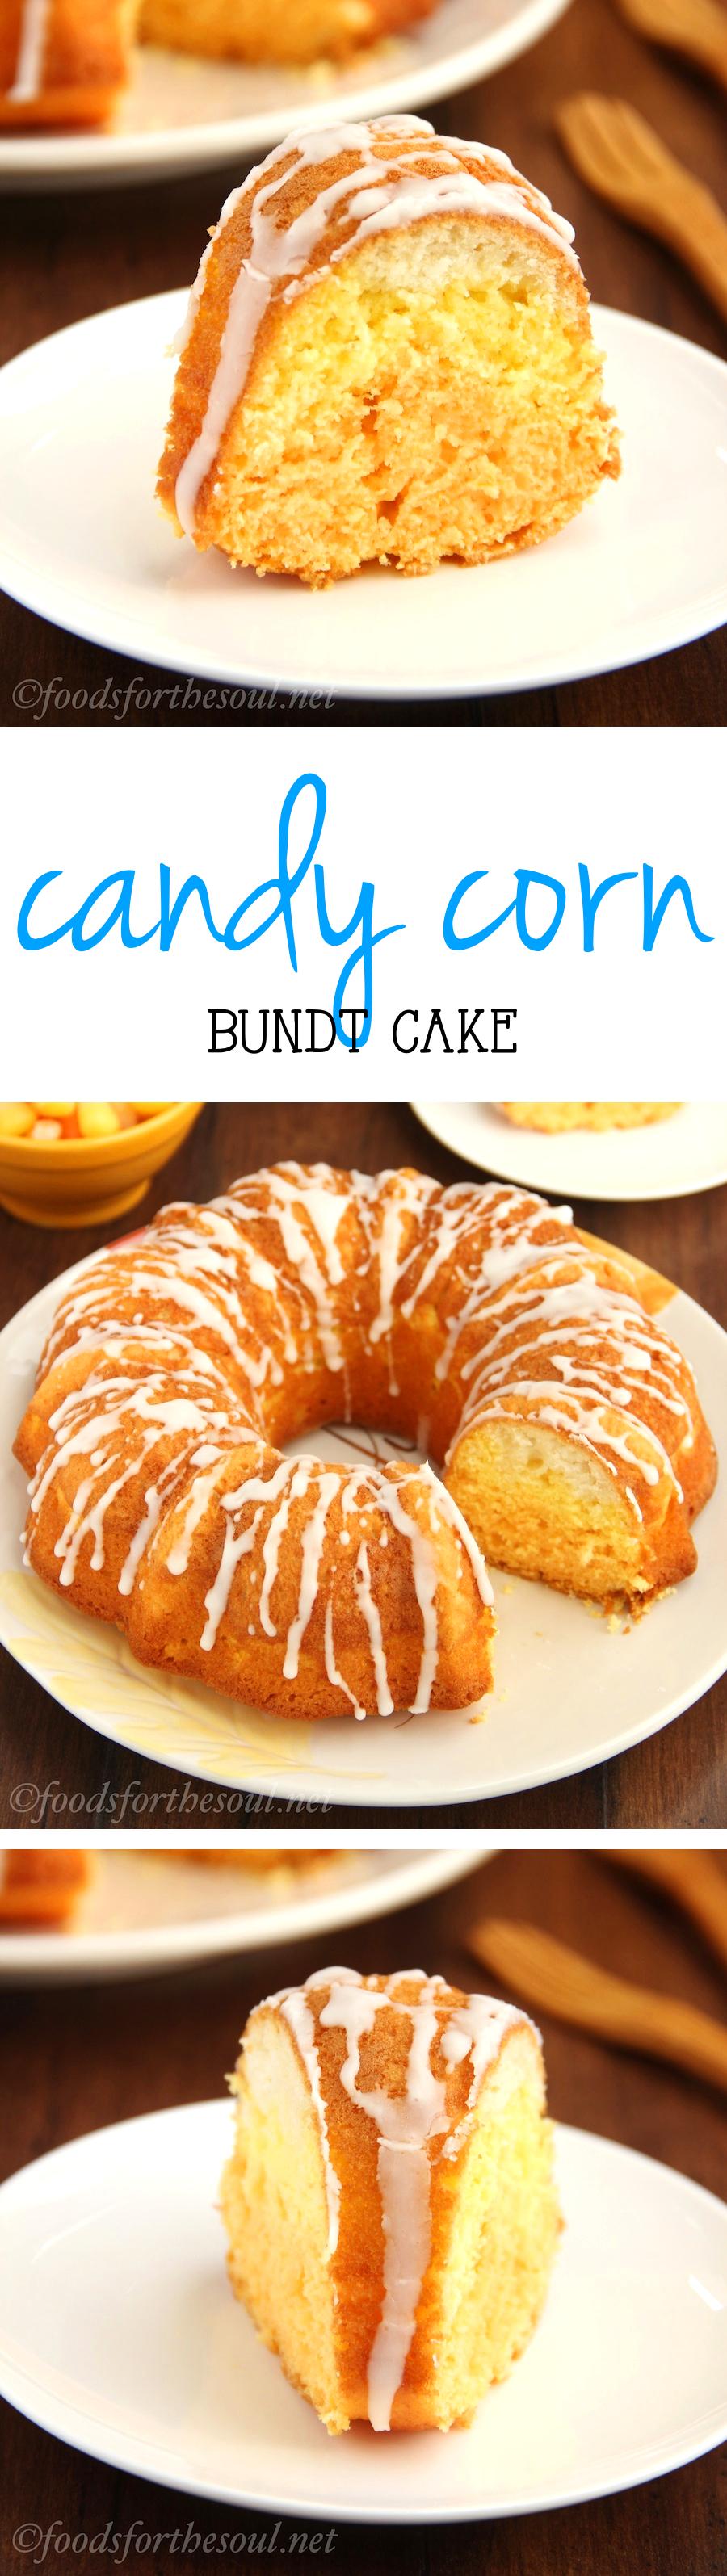 Skinny Candy Corn Bundt Cake -- so cute & fun! Perfect for Halloween!